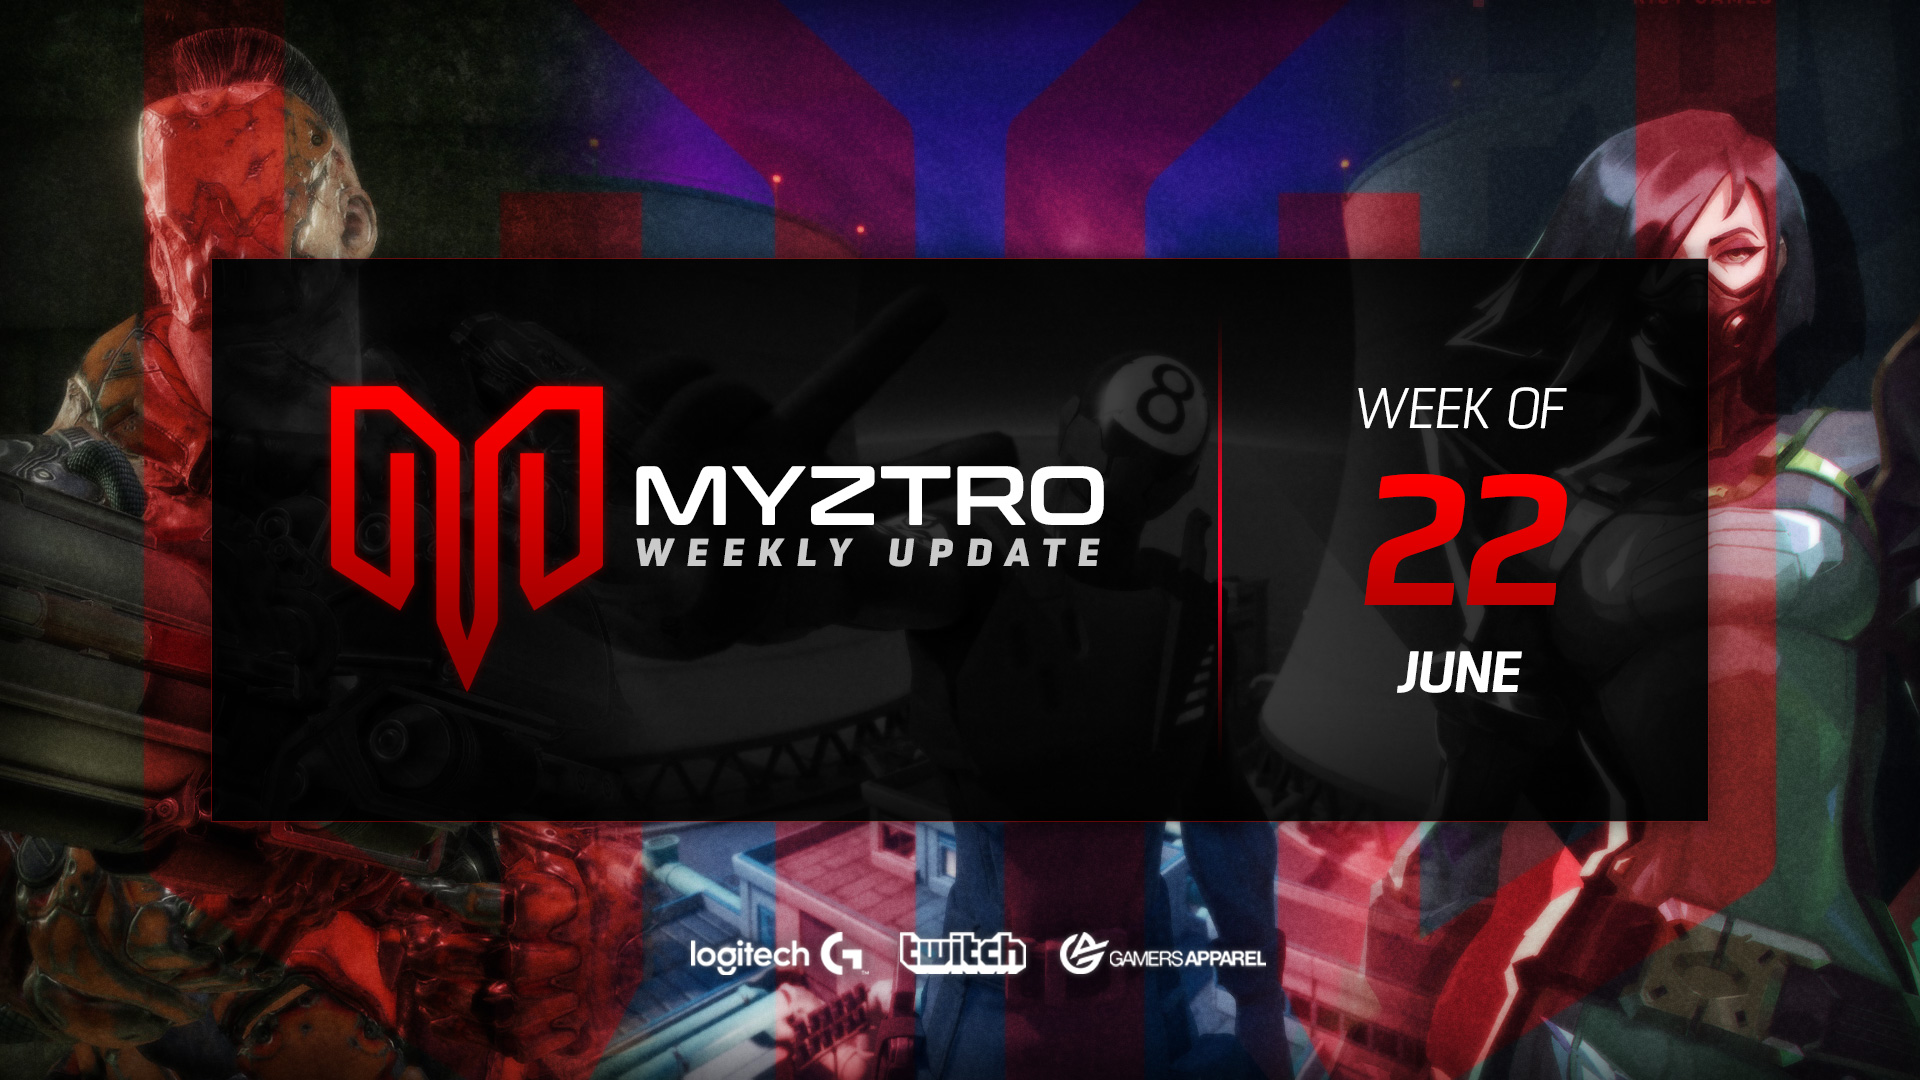 Myztro Weekly Update 18: 6/26/20